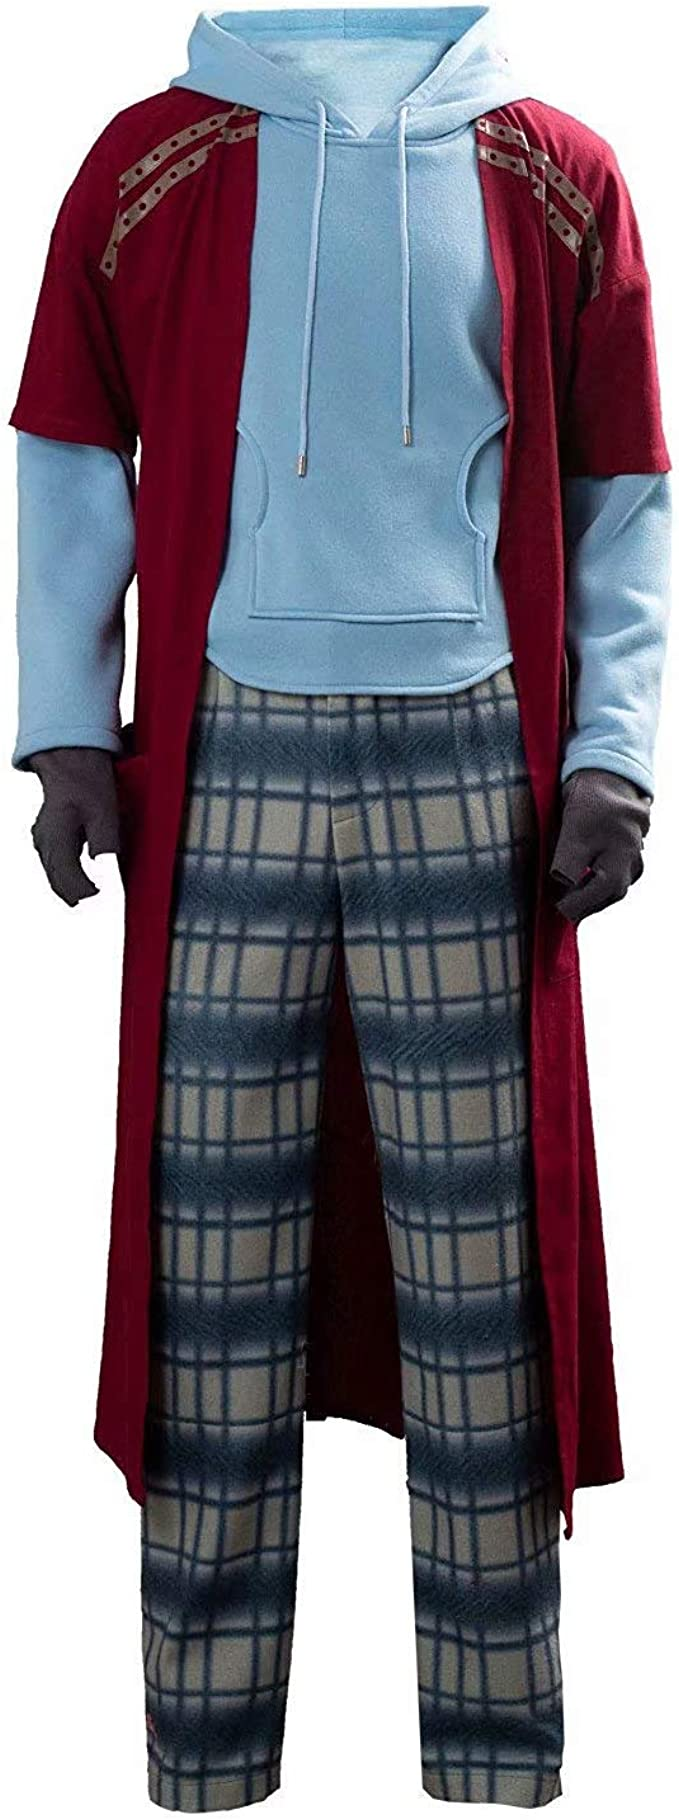 JinYiny Disfraz de Thor Gordo Traje de superhéroe de Halloween ...